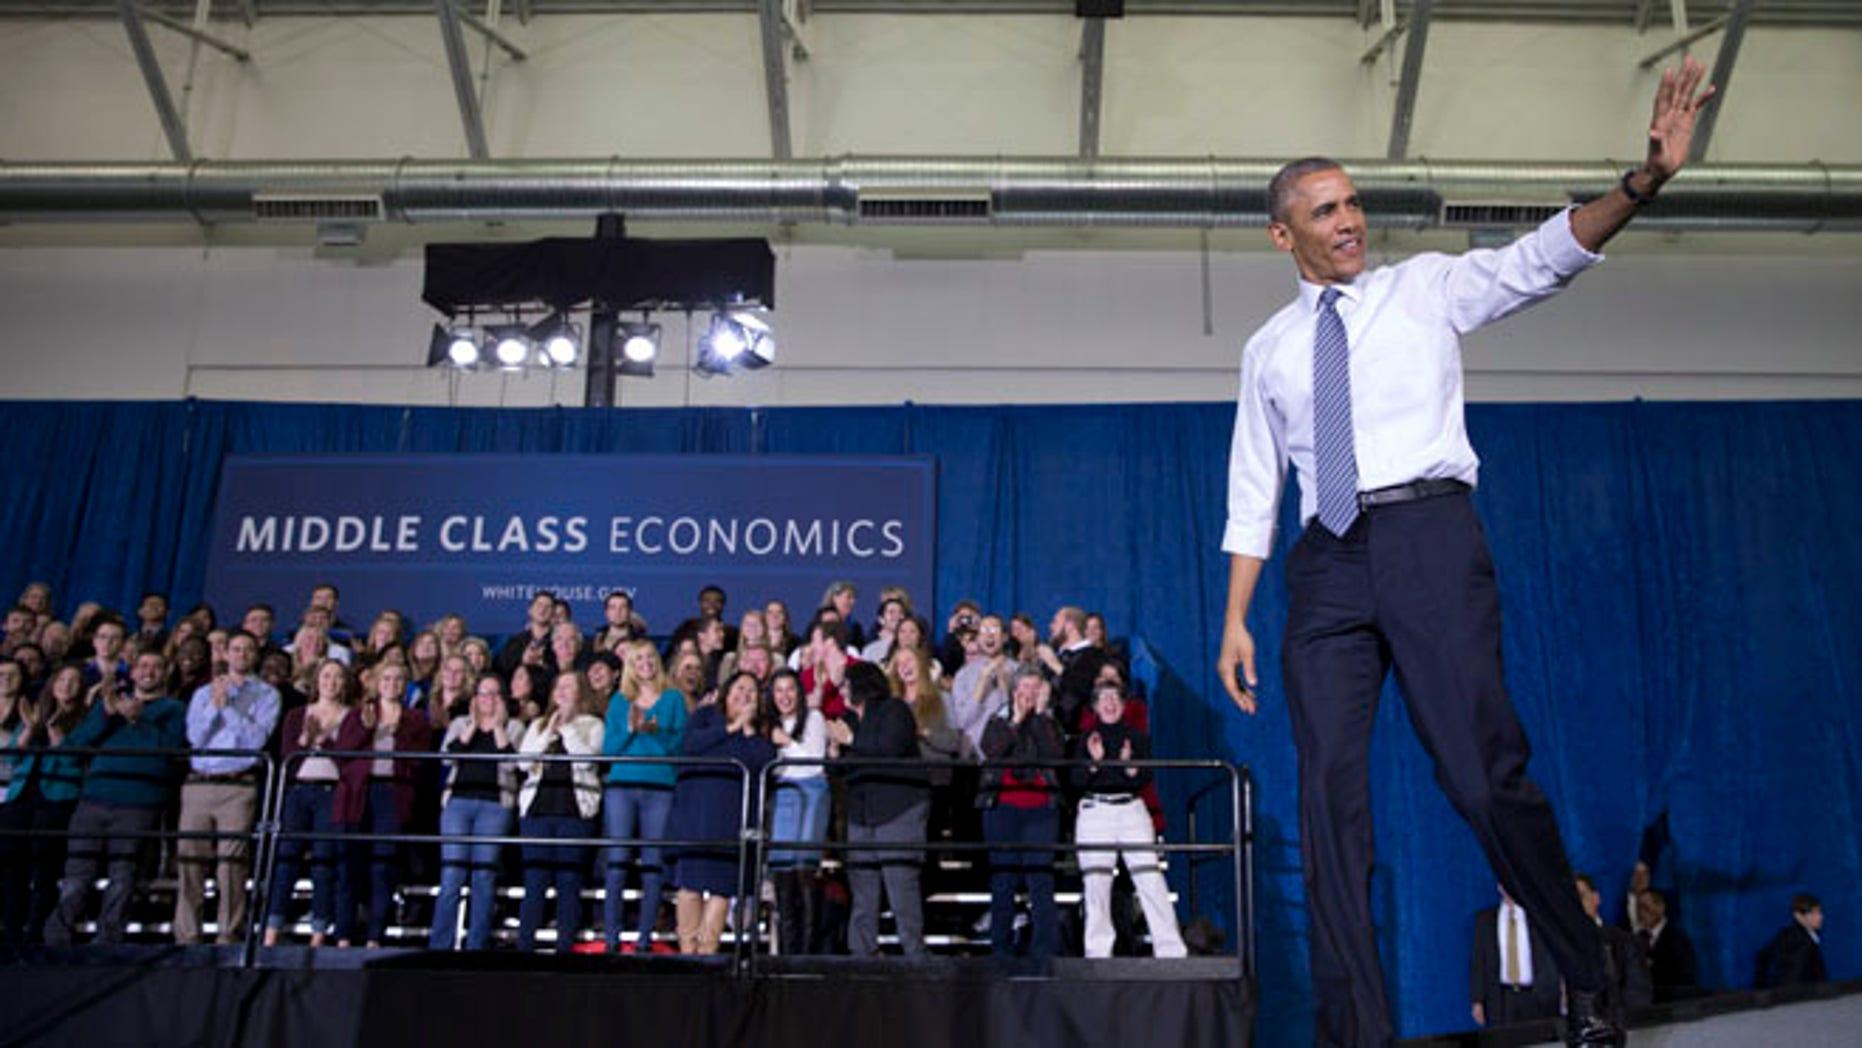 Jan. 21, 2015: President Obama arrives to speak at Boise State University, in Boise, Idaho.